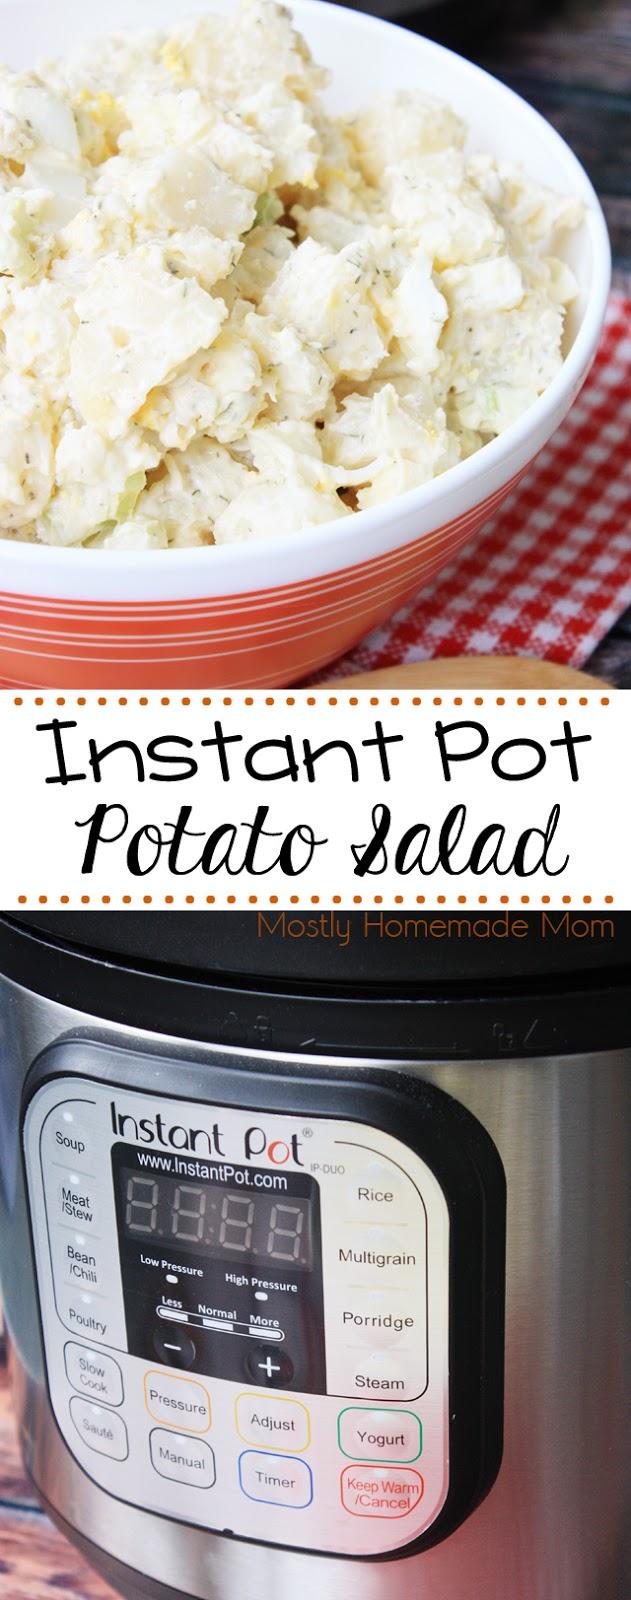 instant pot 7 in 1 potato salad